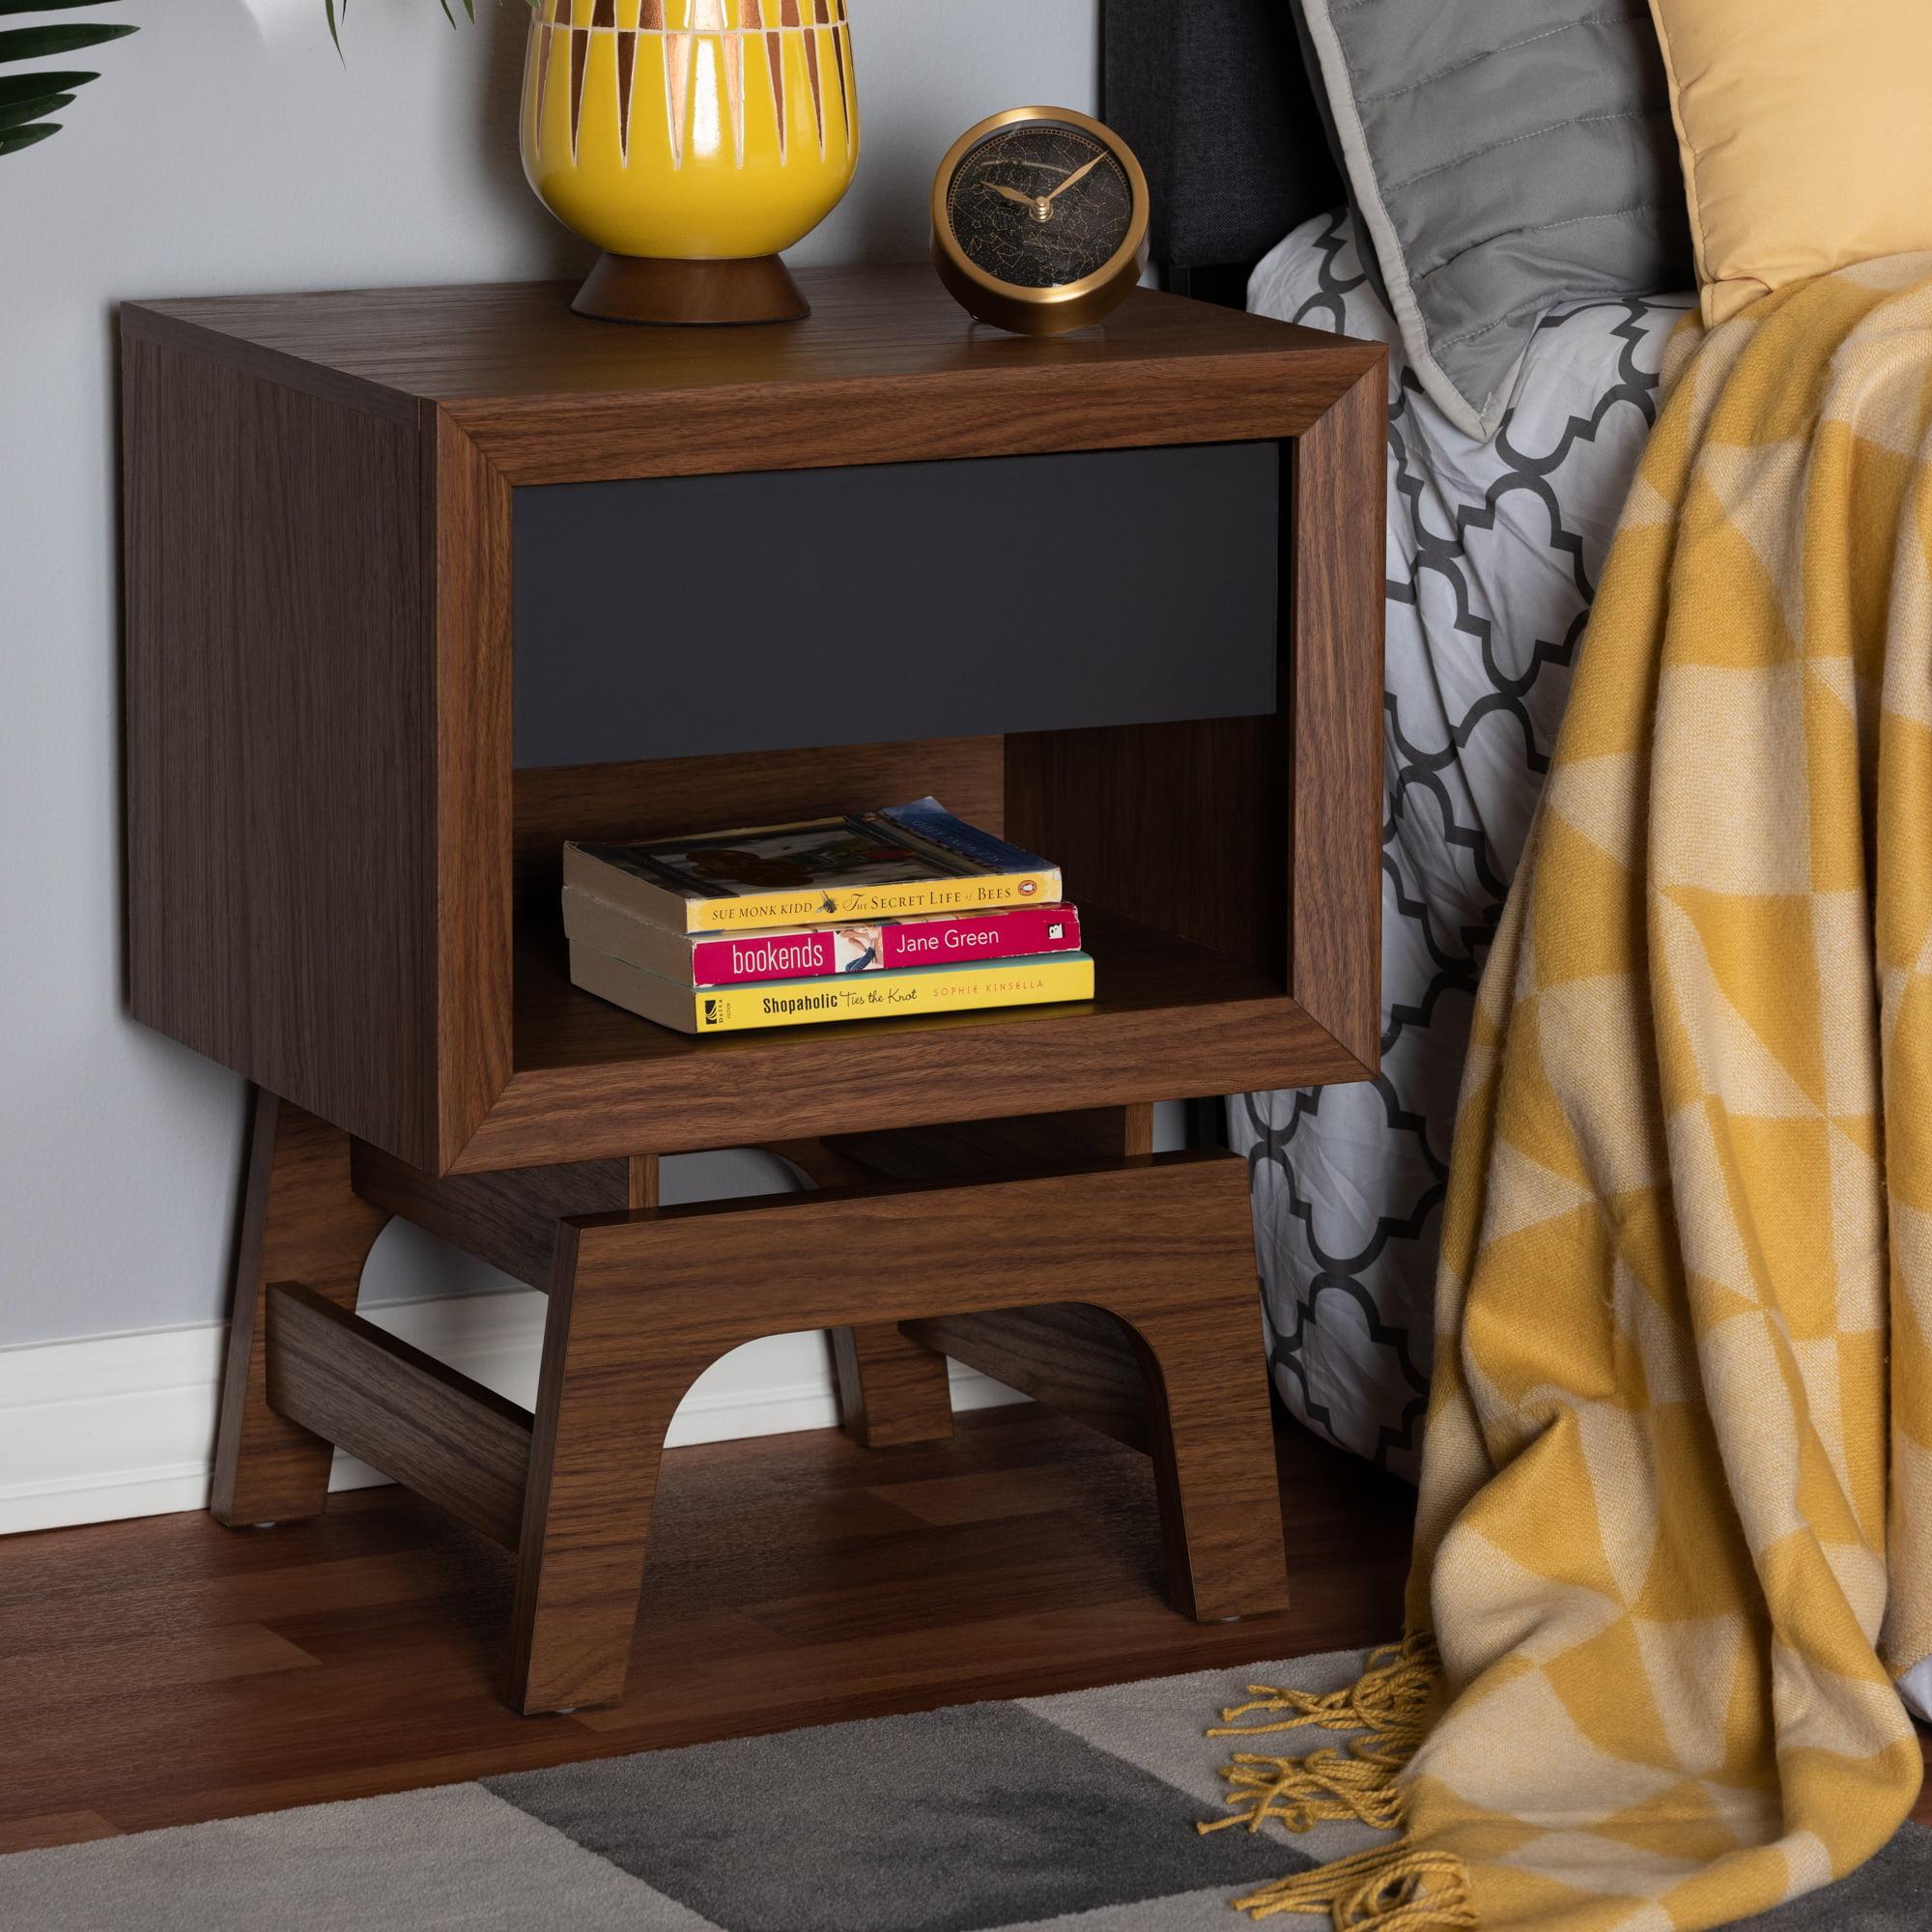 Baxton Studio Svante Mid-Century Modern Walnut Brown and Dark Gray Finished Wood 1-Drawer Nightstand